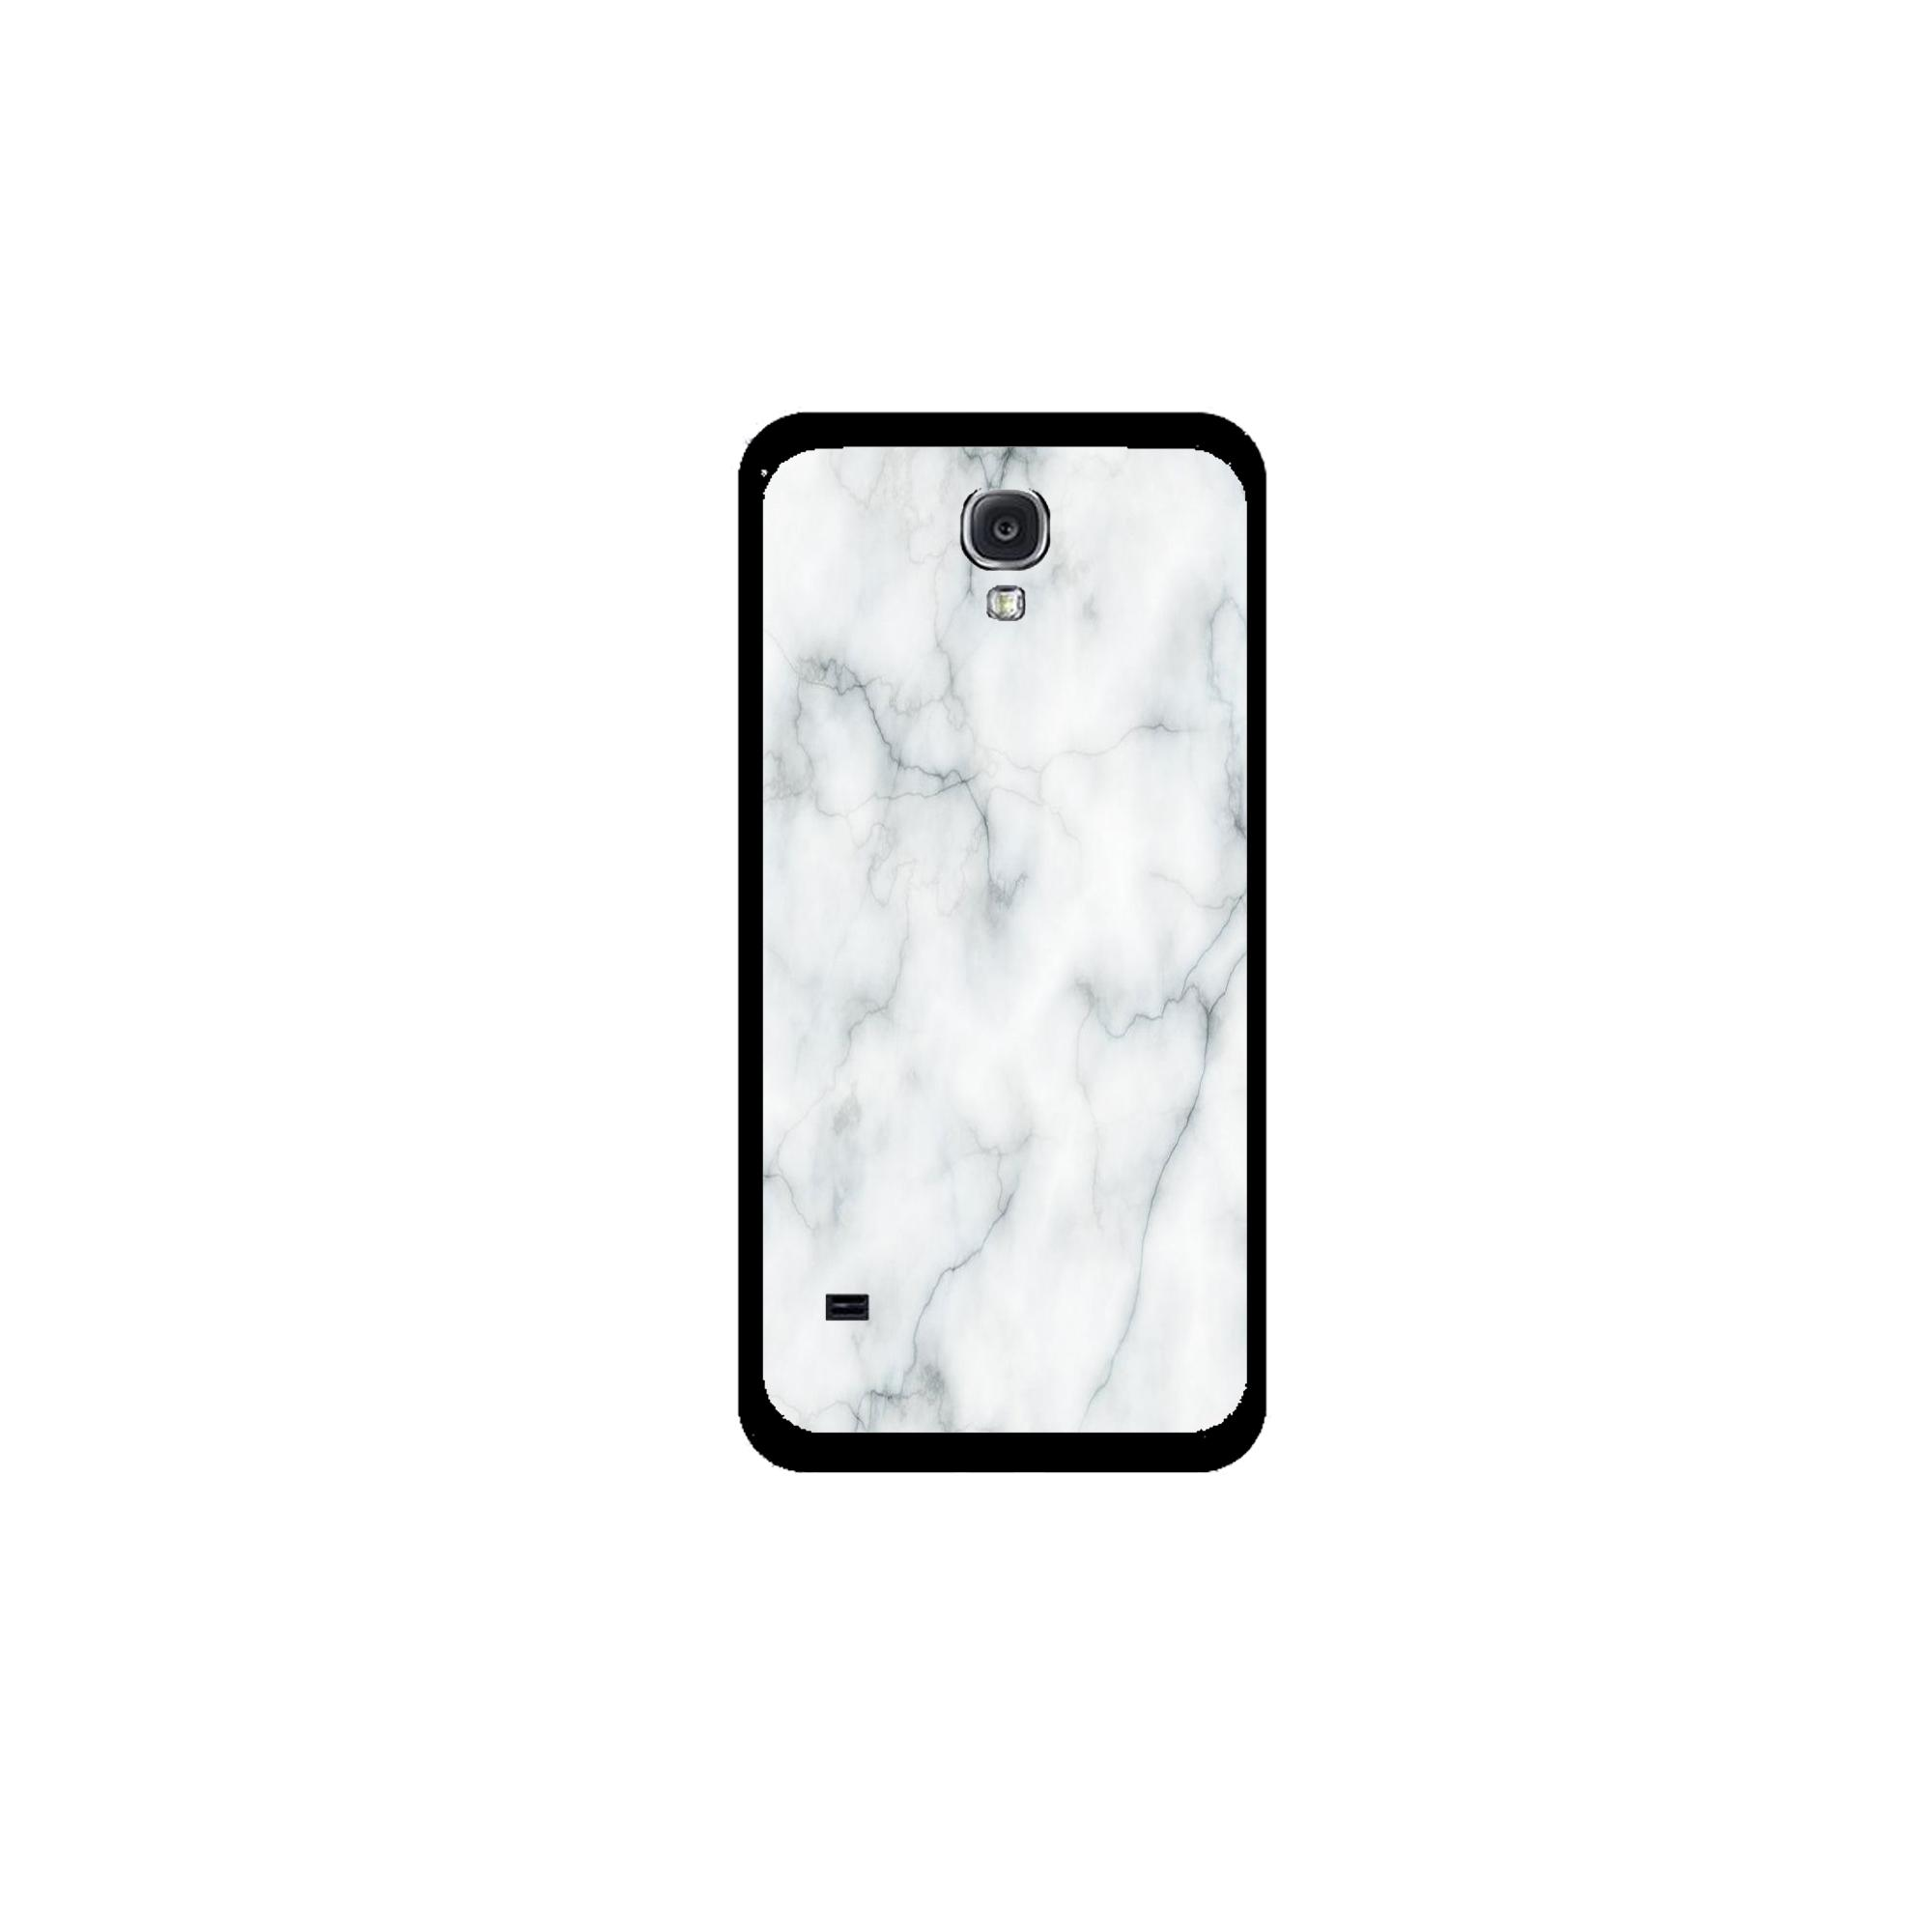 Rajamurah fashion printing case Samsung Galaxy S4 - 1